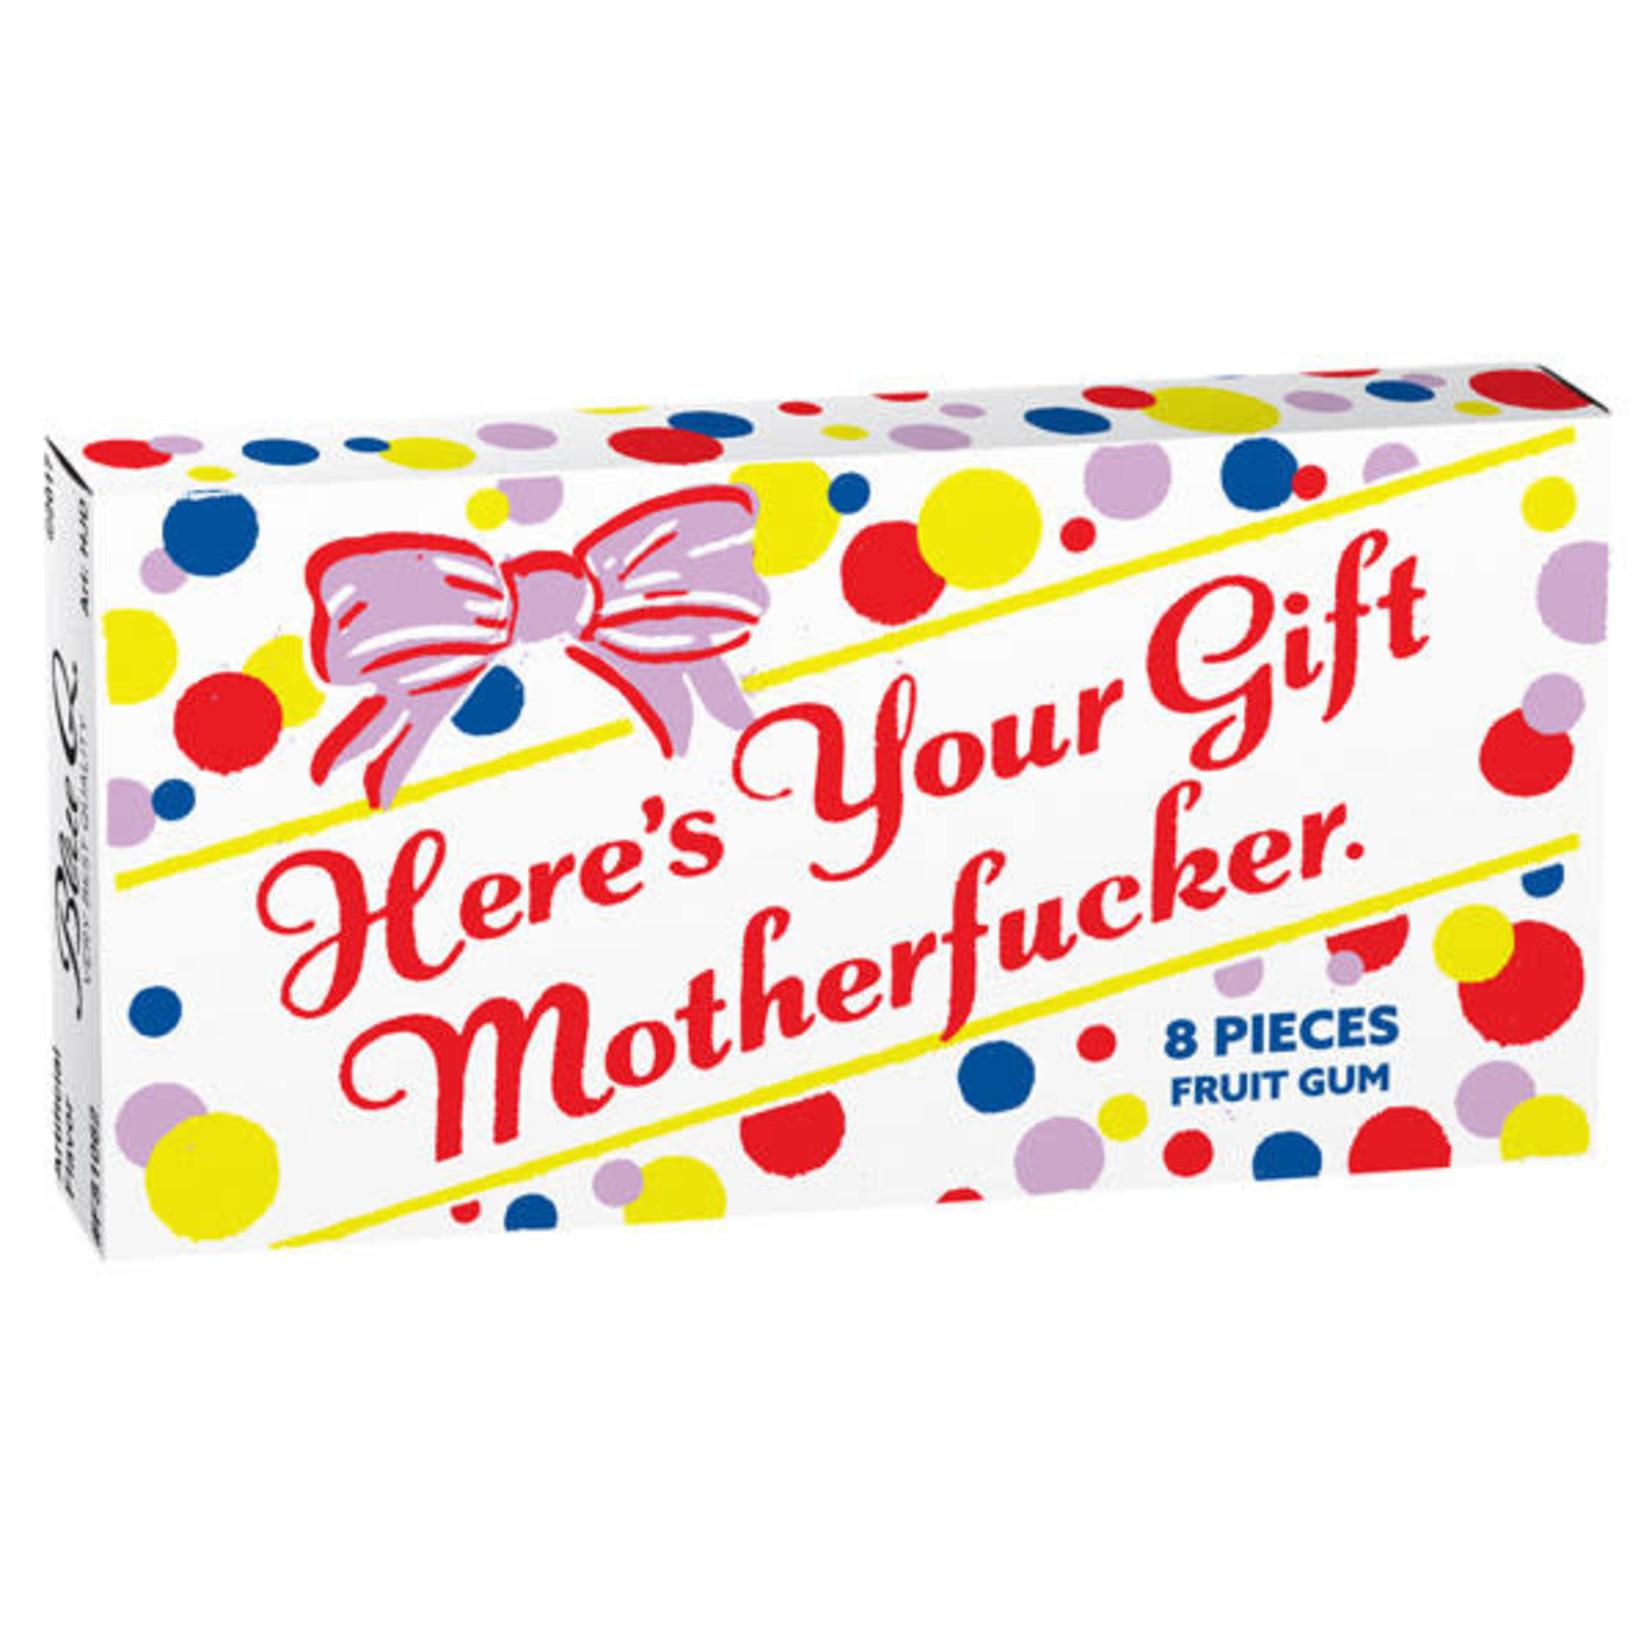 Gum - Here's Your Gift Motherfucker